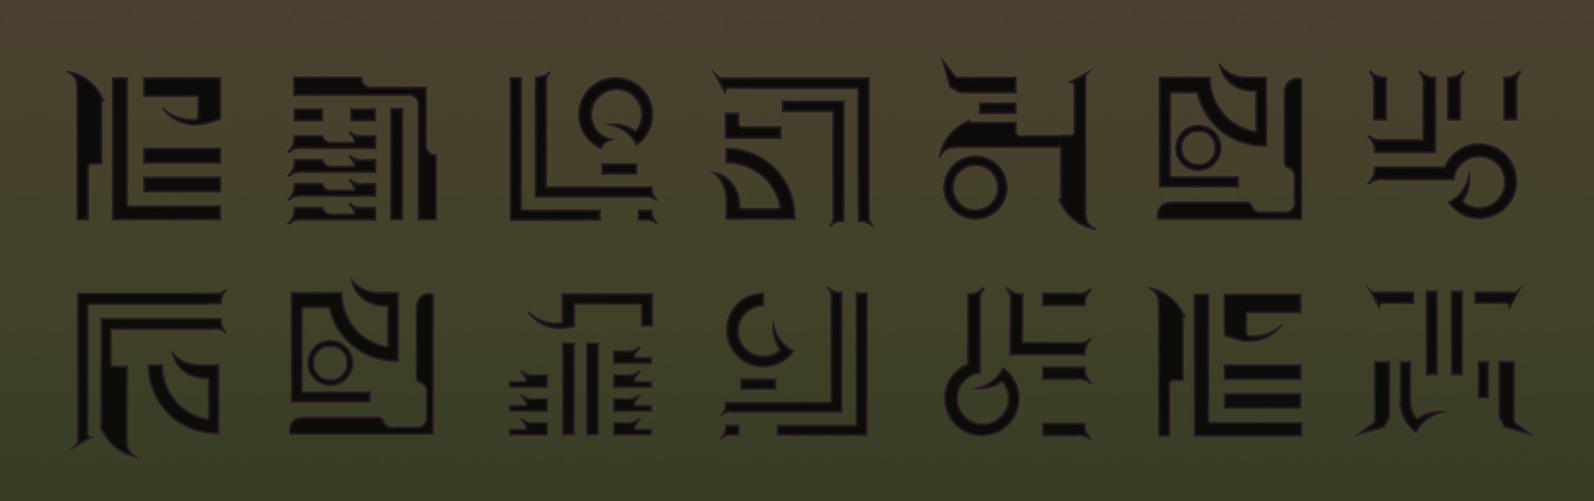 Blade 3 Trinity glyph's by Espertjuh